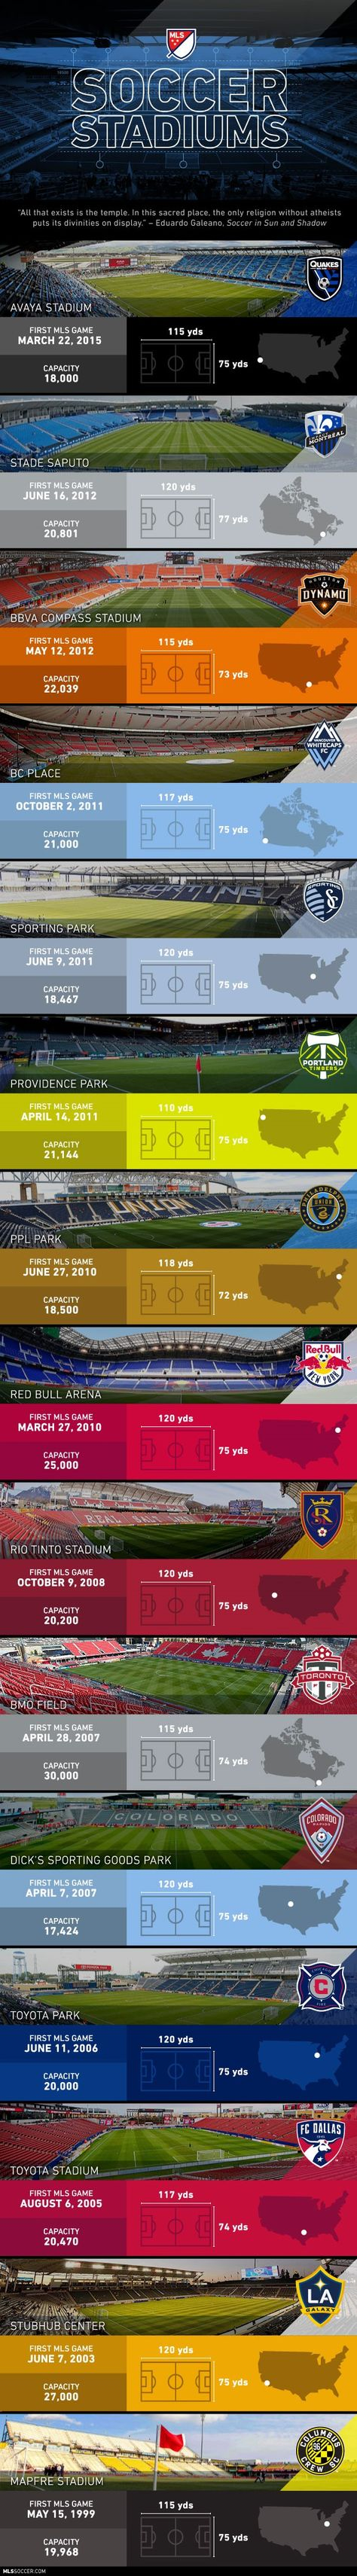 INFOGRAPHIC: Avaya Stadium becomes 15th soccer stadium in MLS | MLSsoccer.com